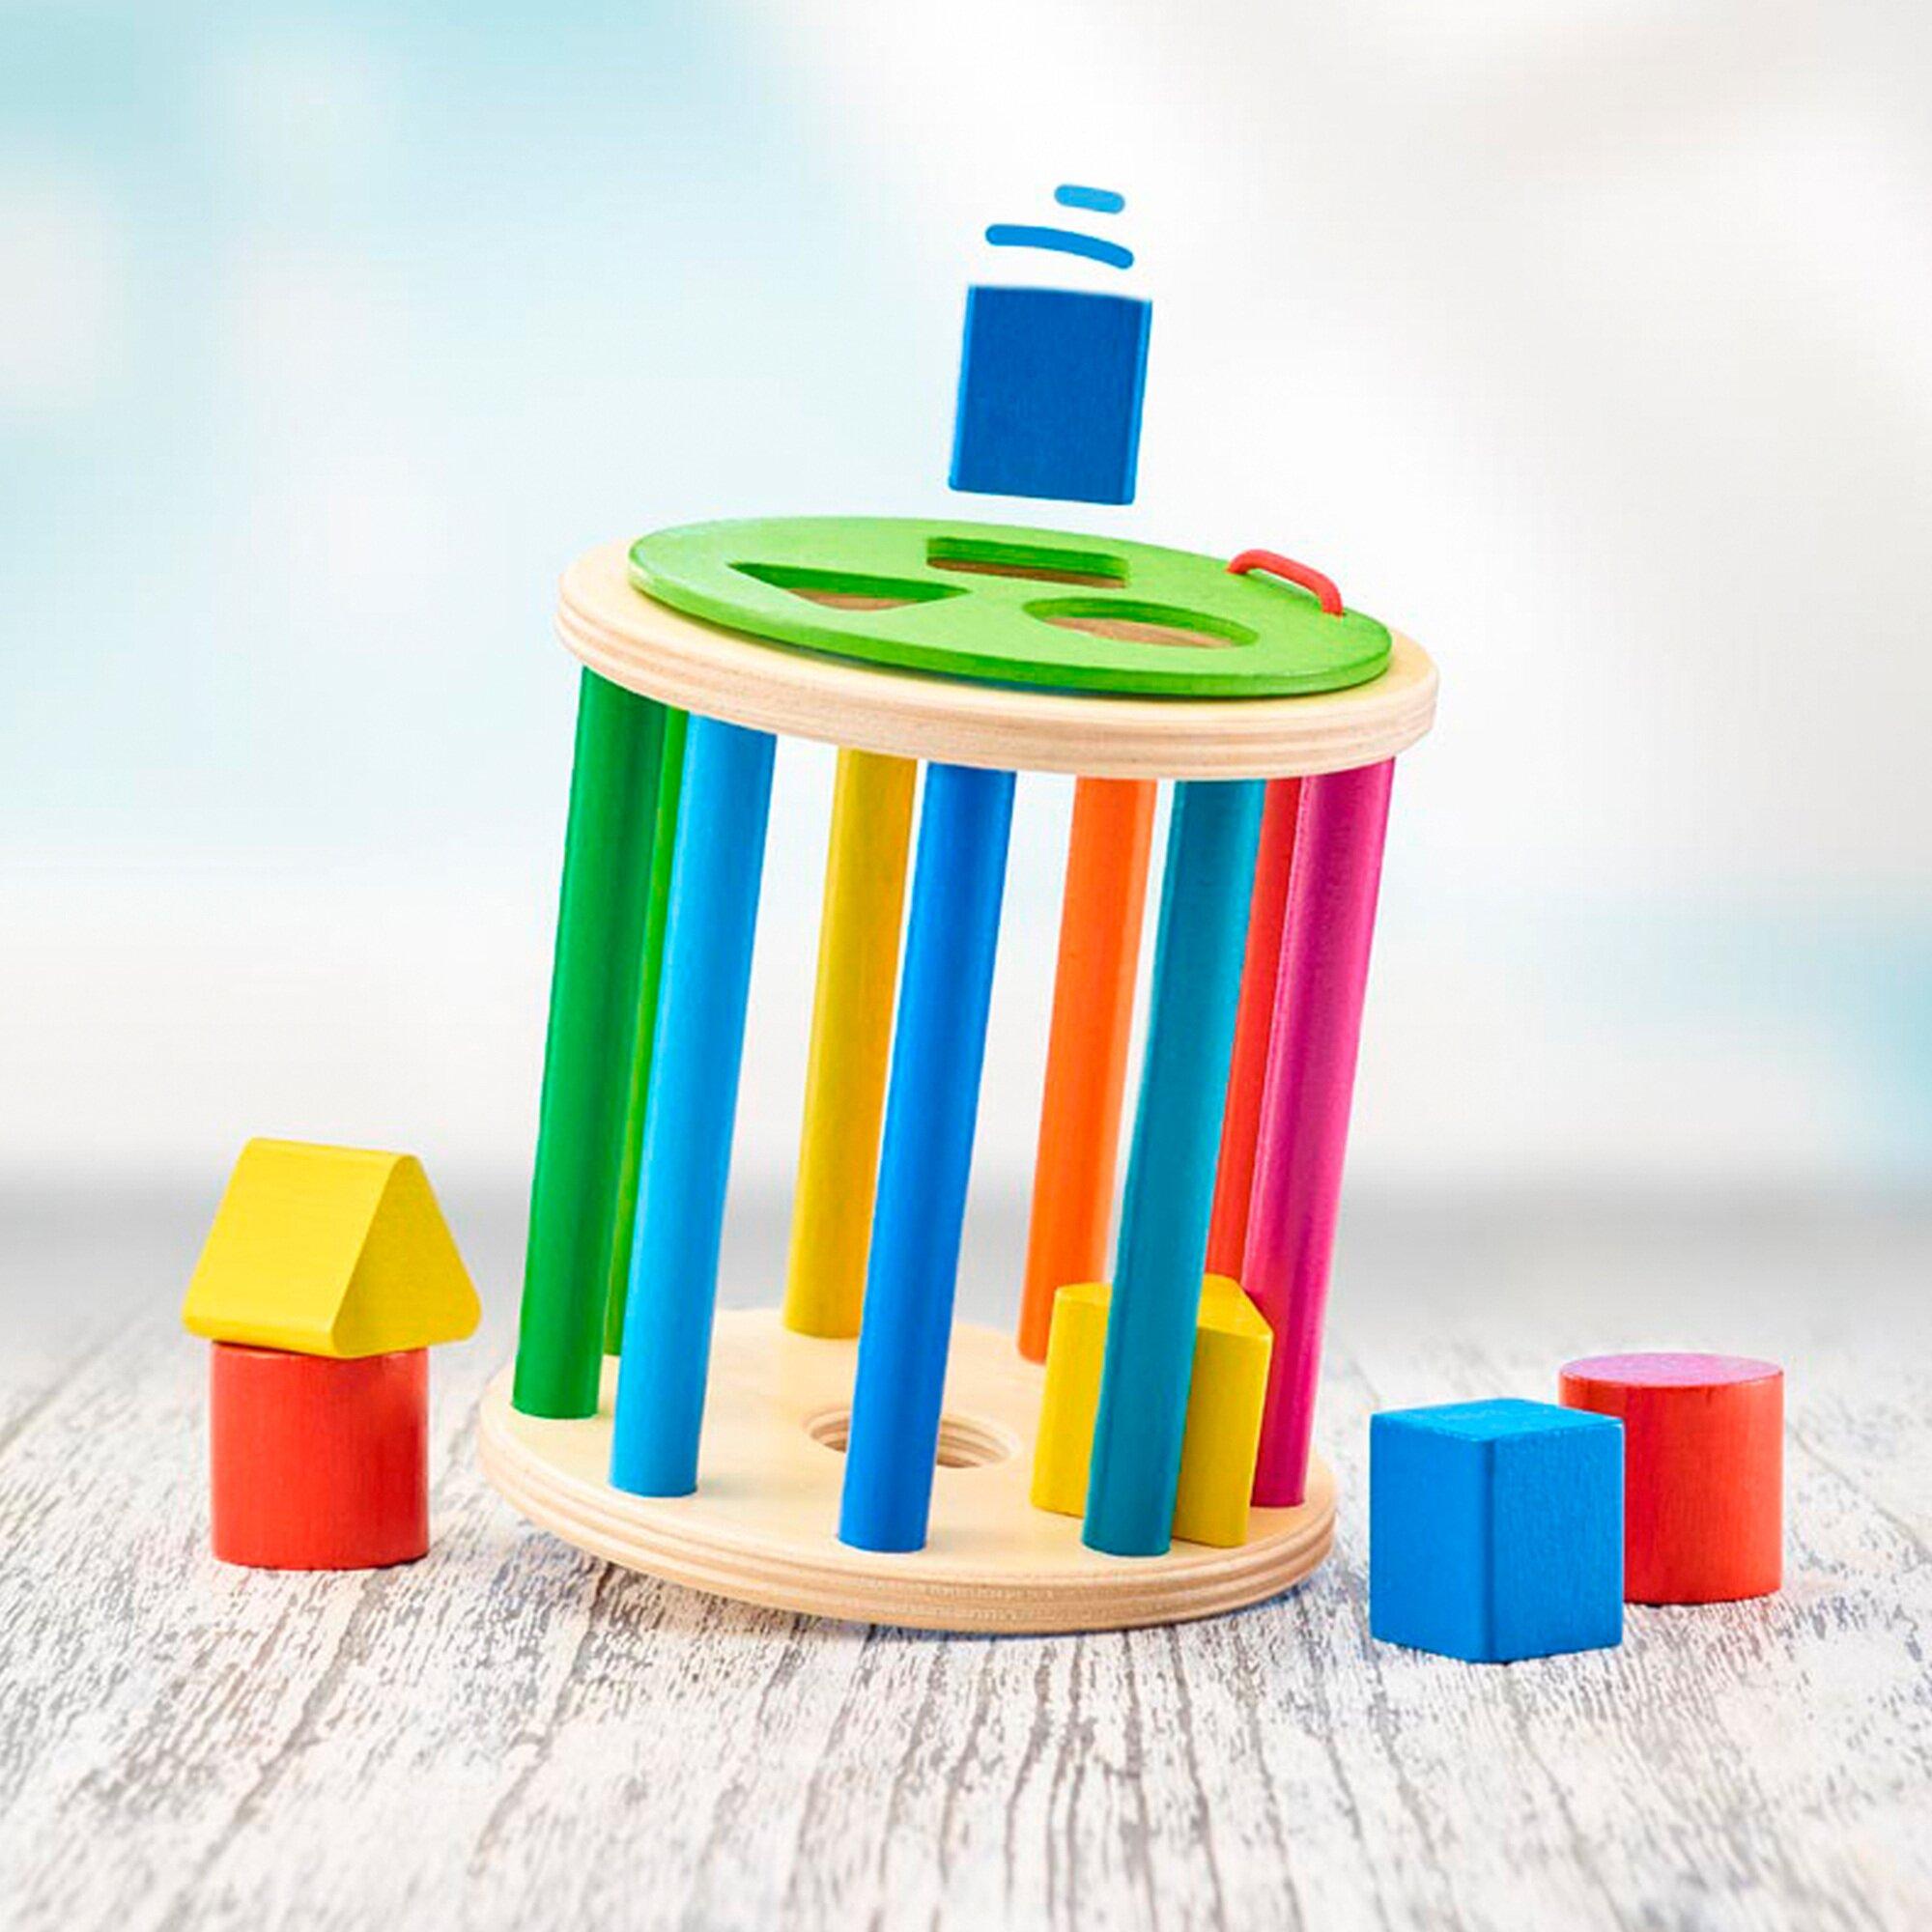 selecta-steckspiel-sortierrolle-aus-holz